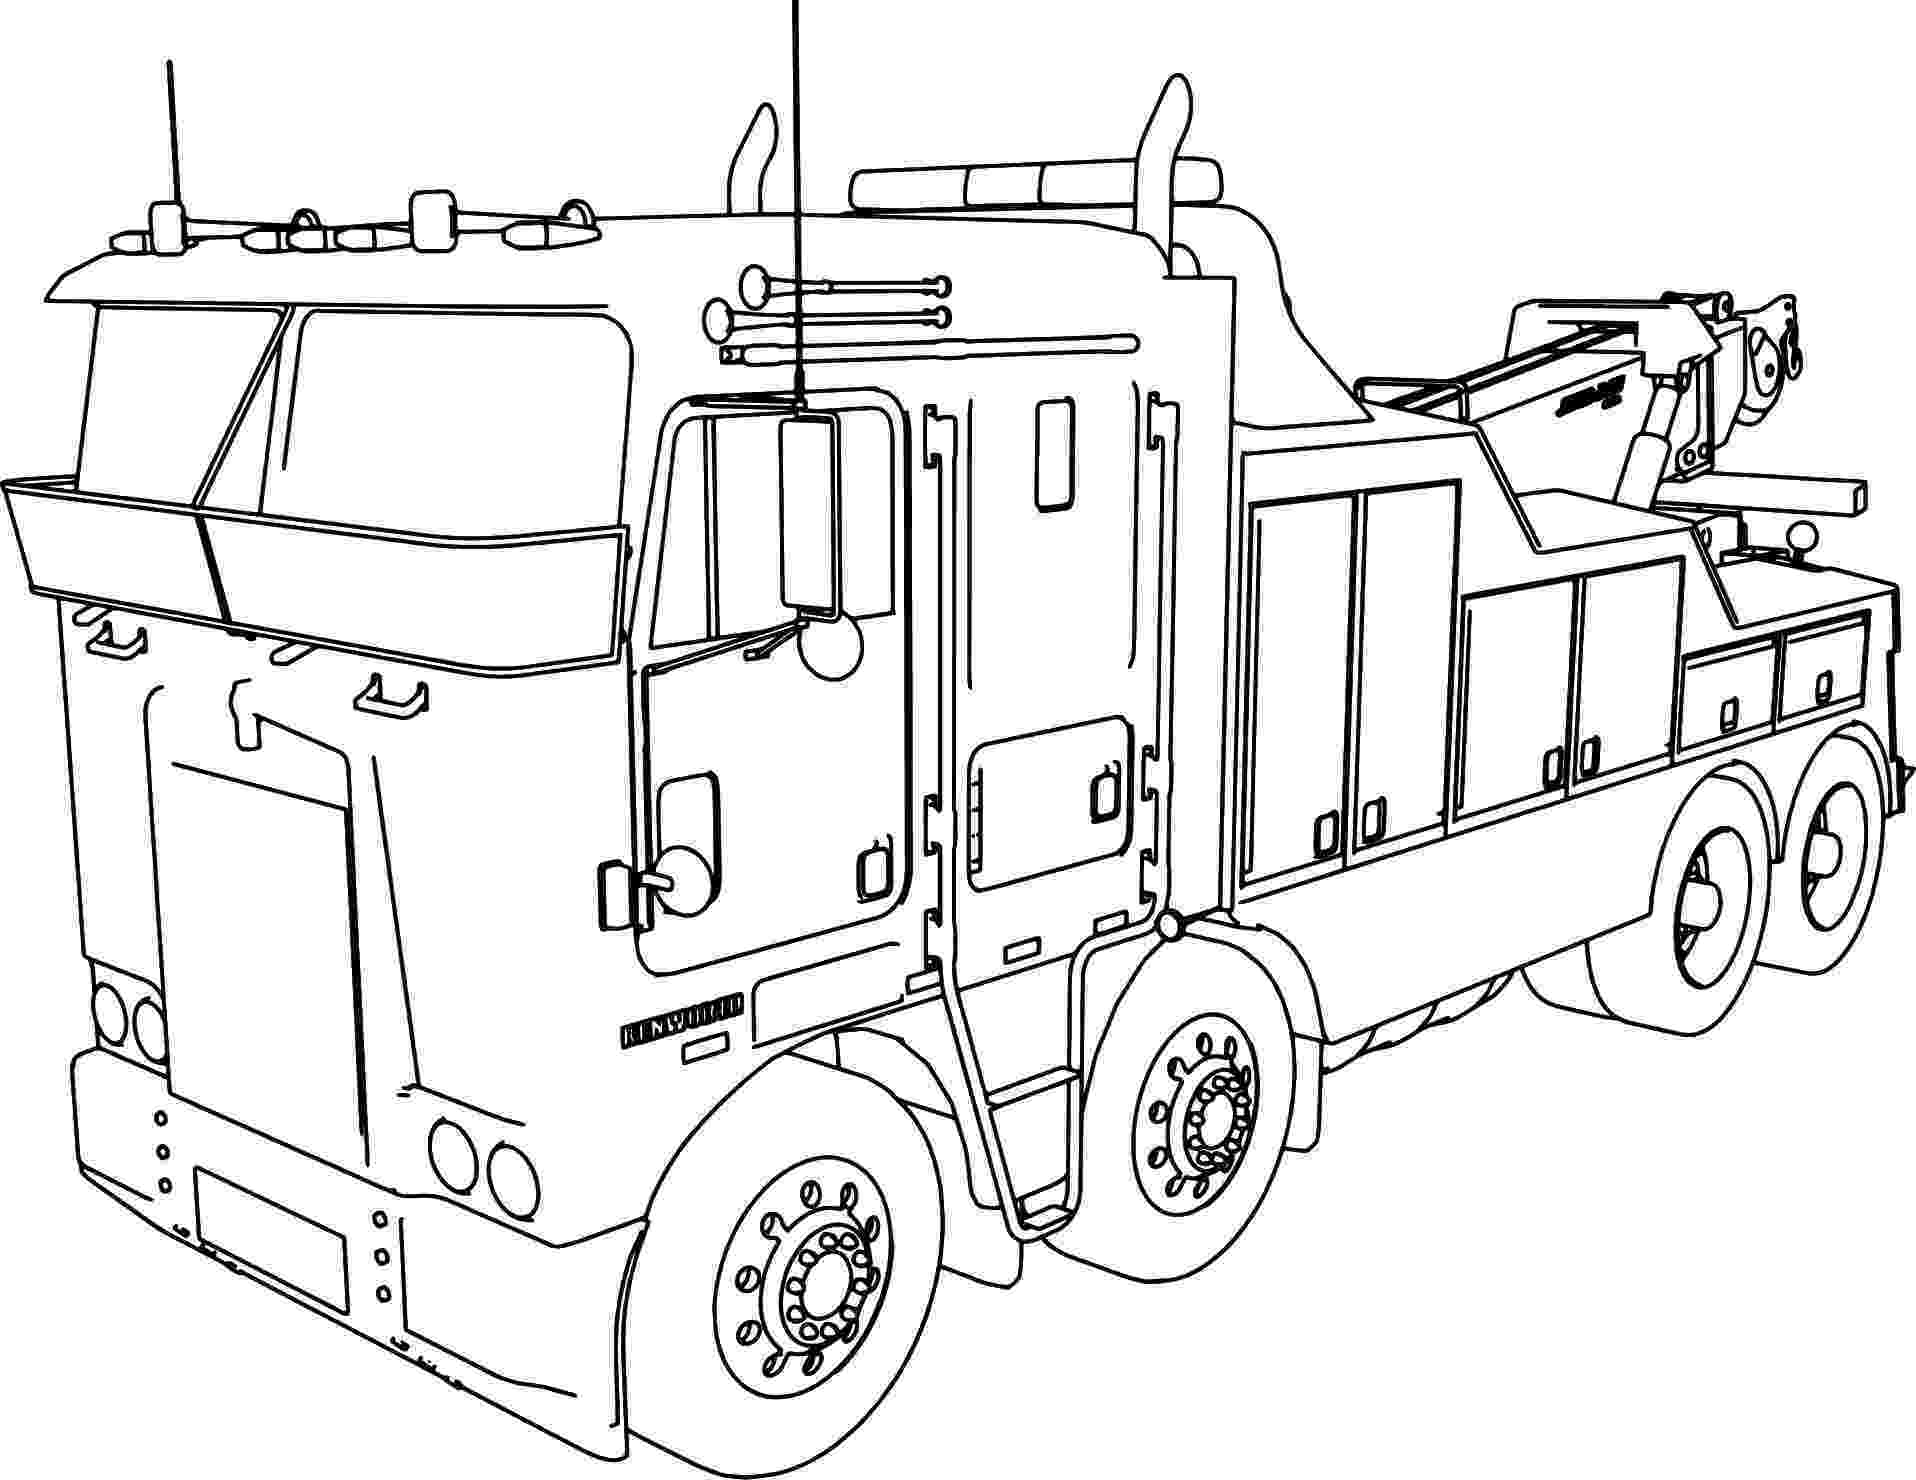 coloring pages of semi trucks semi truck coloring pages at getcoloringscom free trucks pages of semi coloring